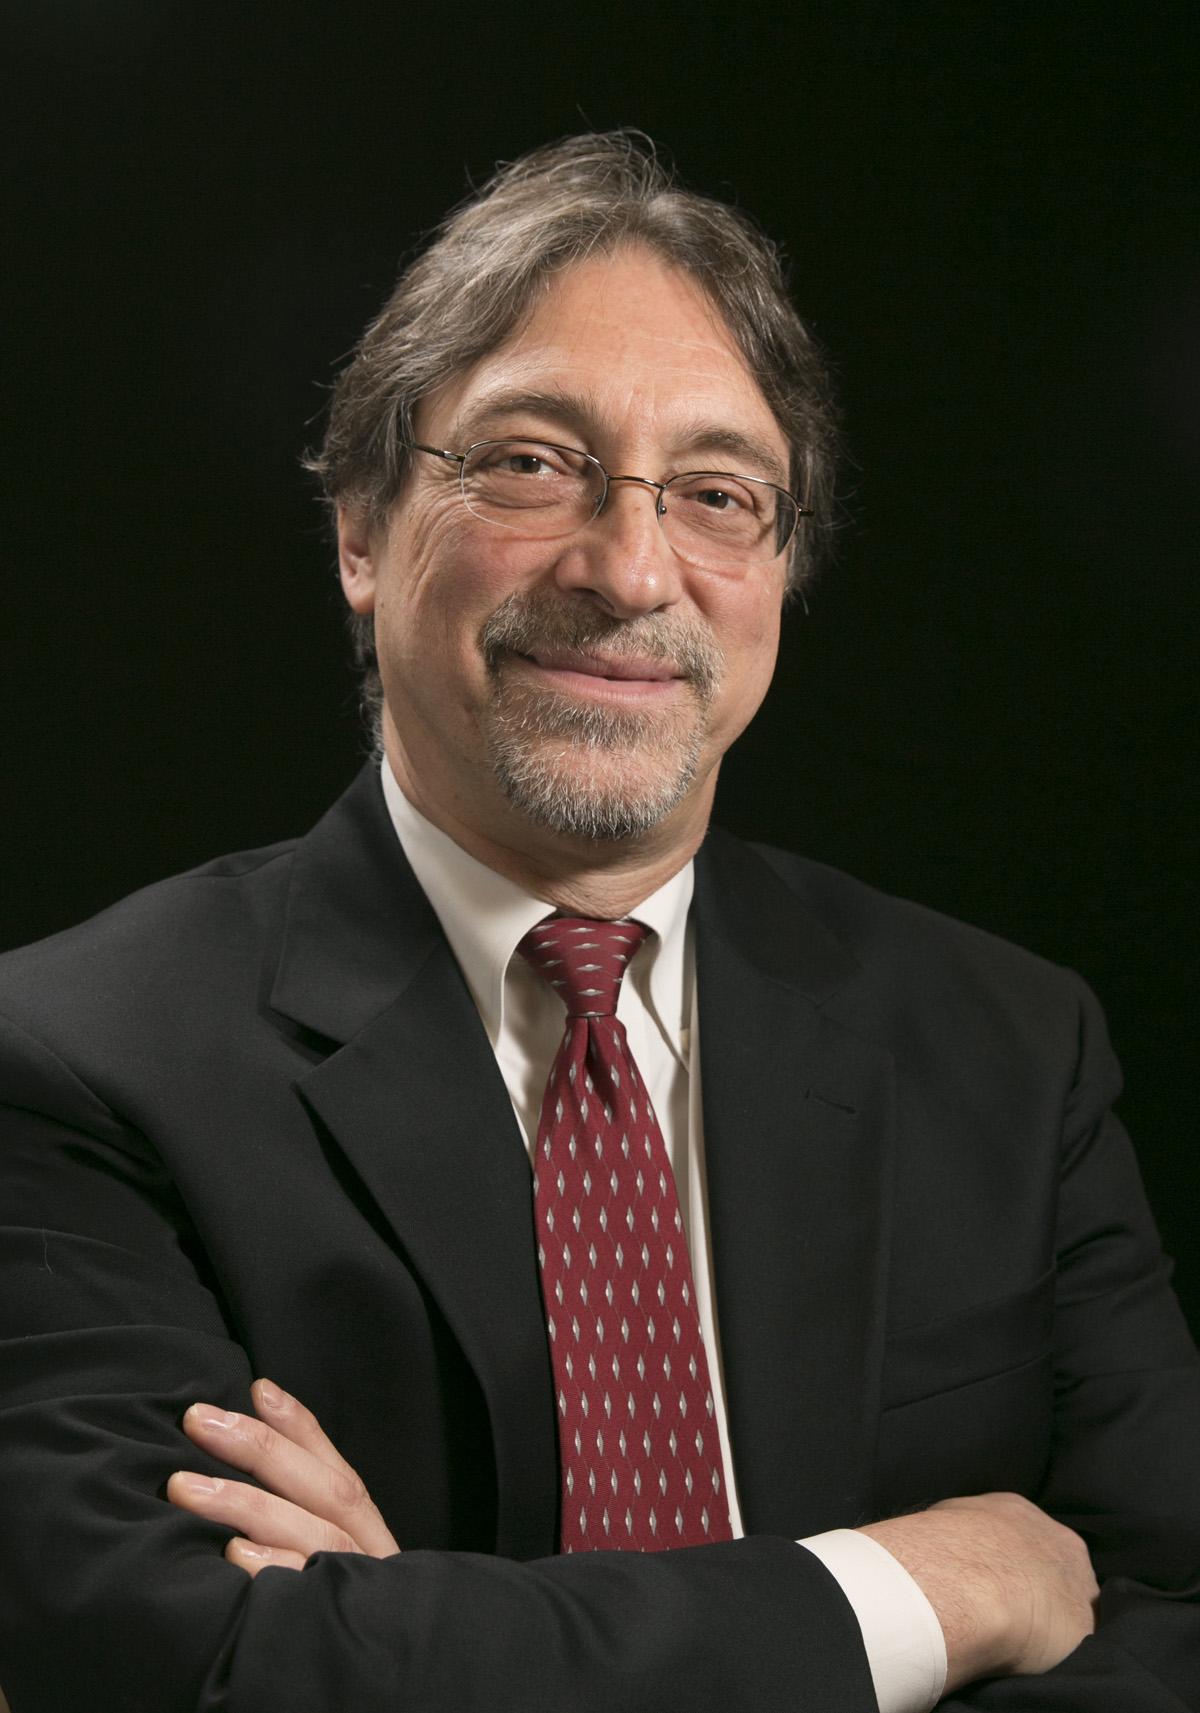 Head-shot of Dr. John DeLuca